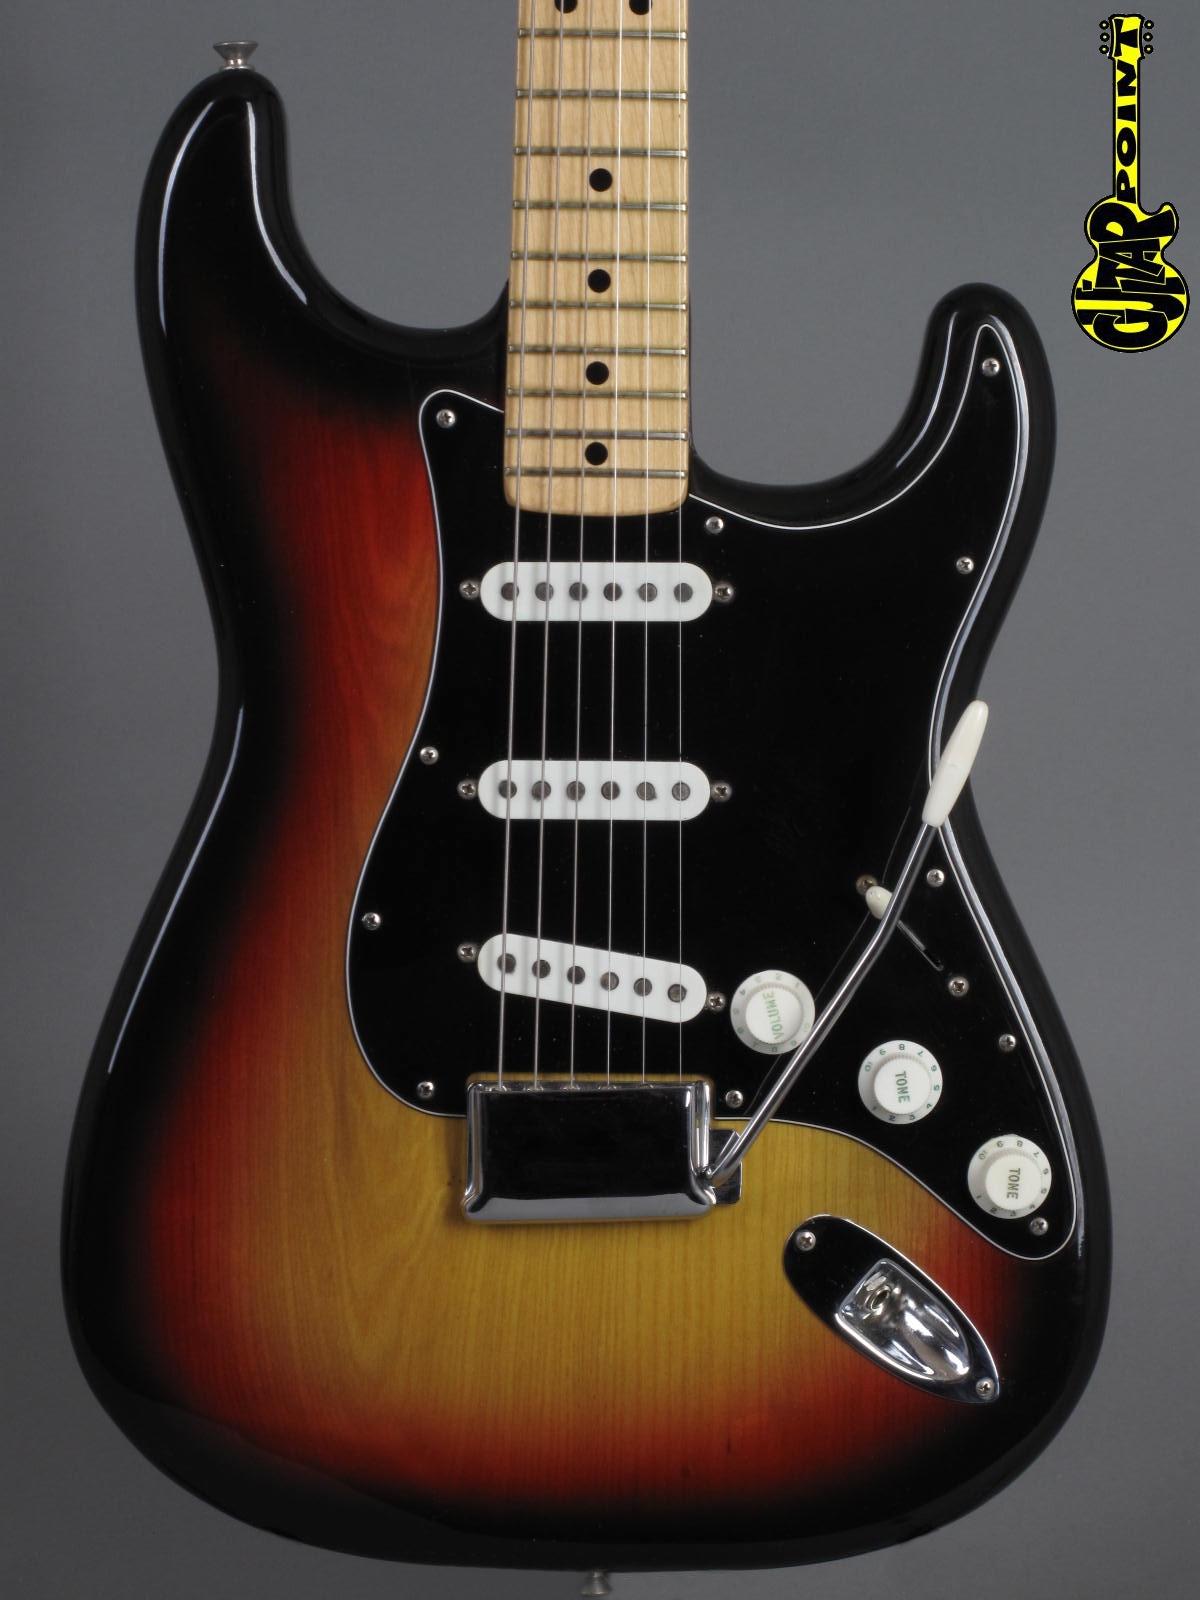 1976 Fender Stratocaster - 3-tone Sunburst ...clean !!!